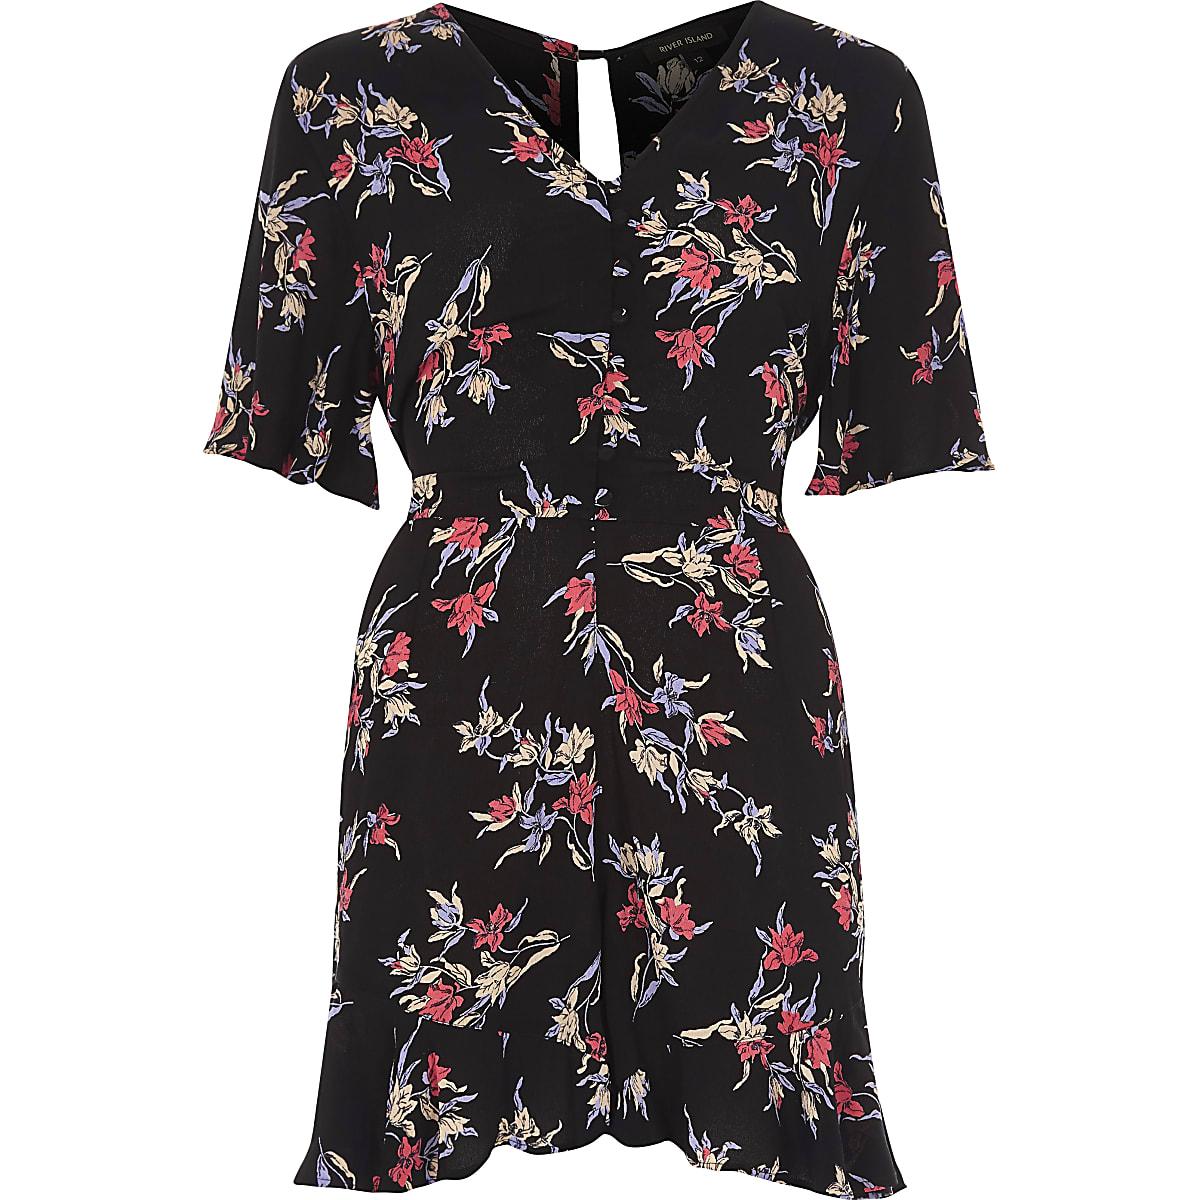 Black floral print tea dress style playsuit